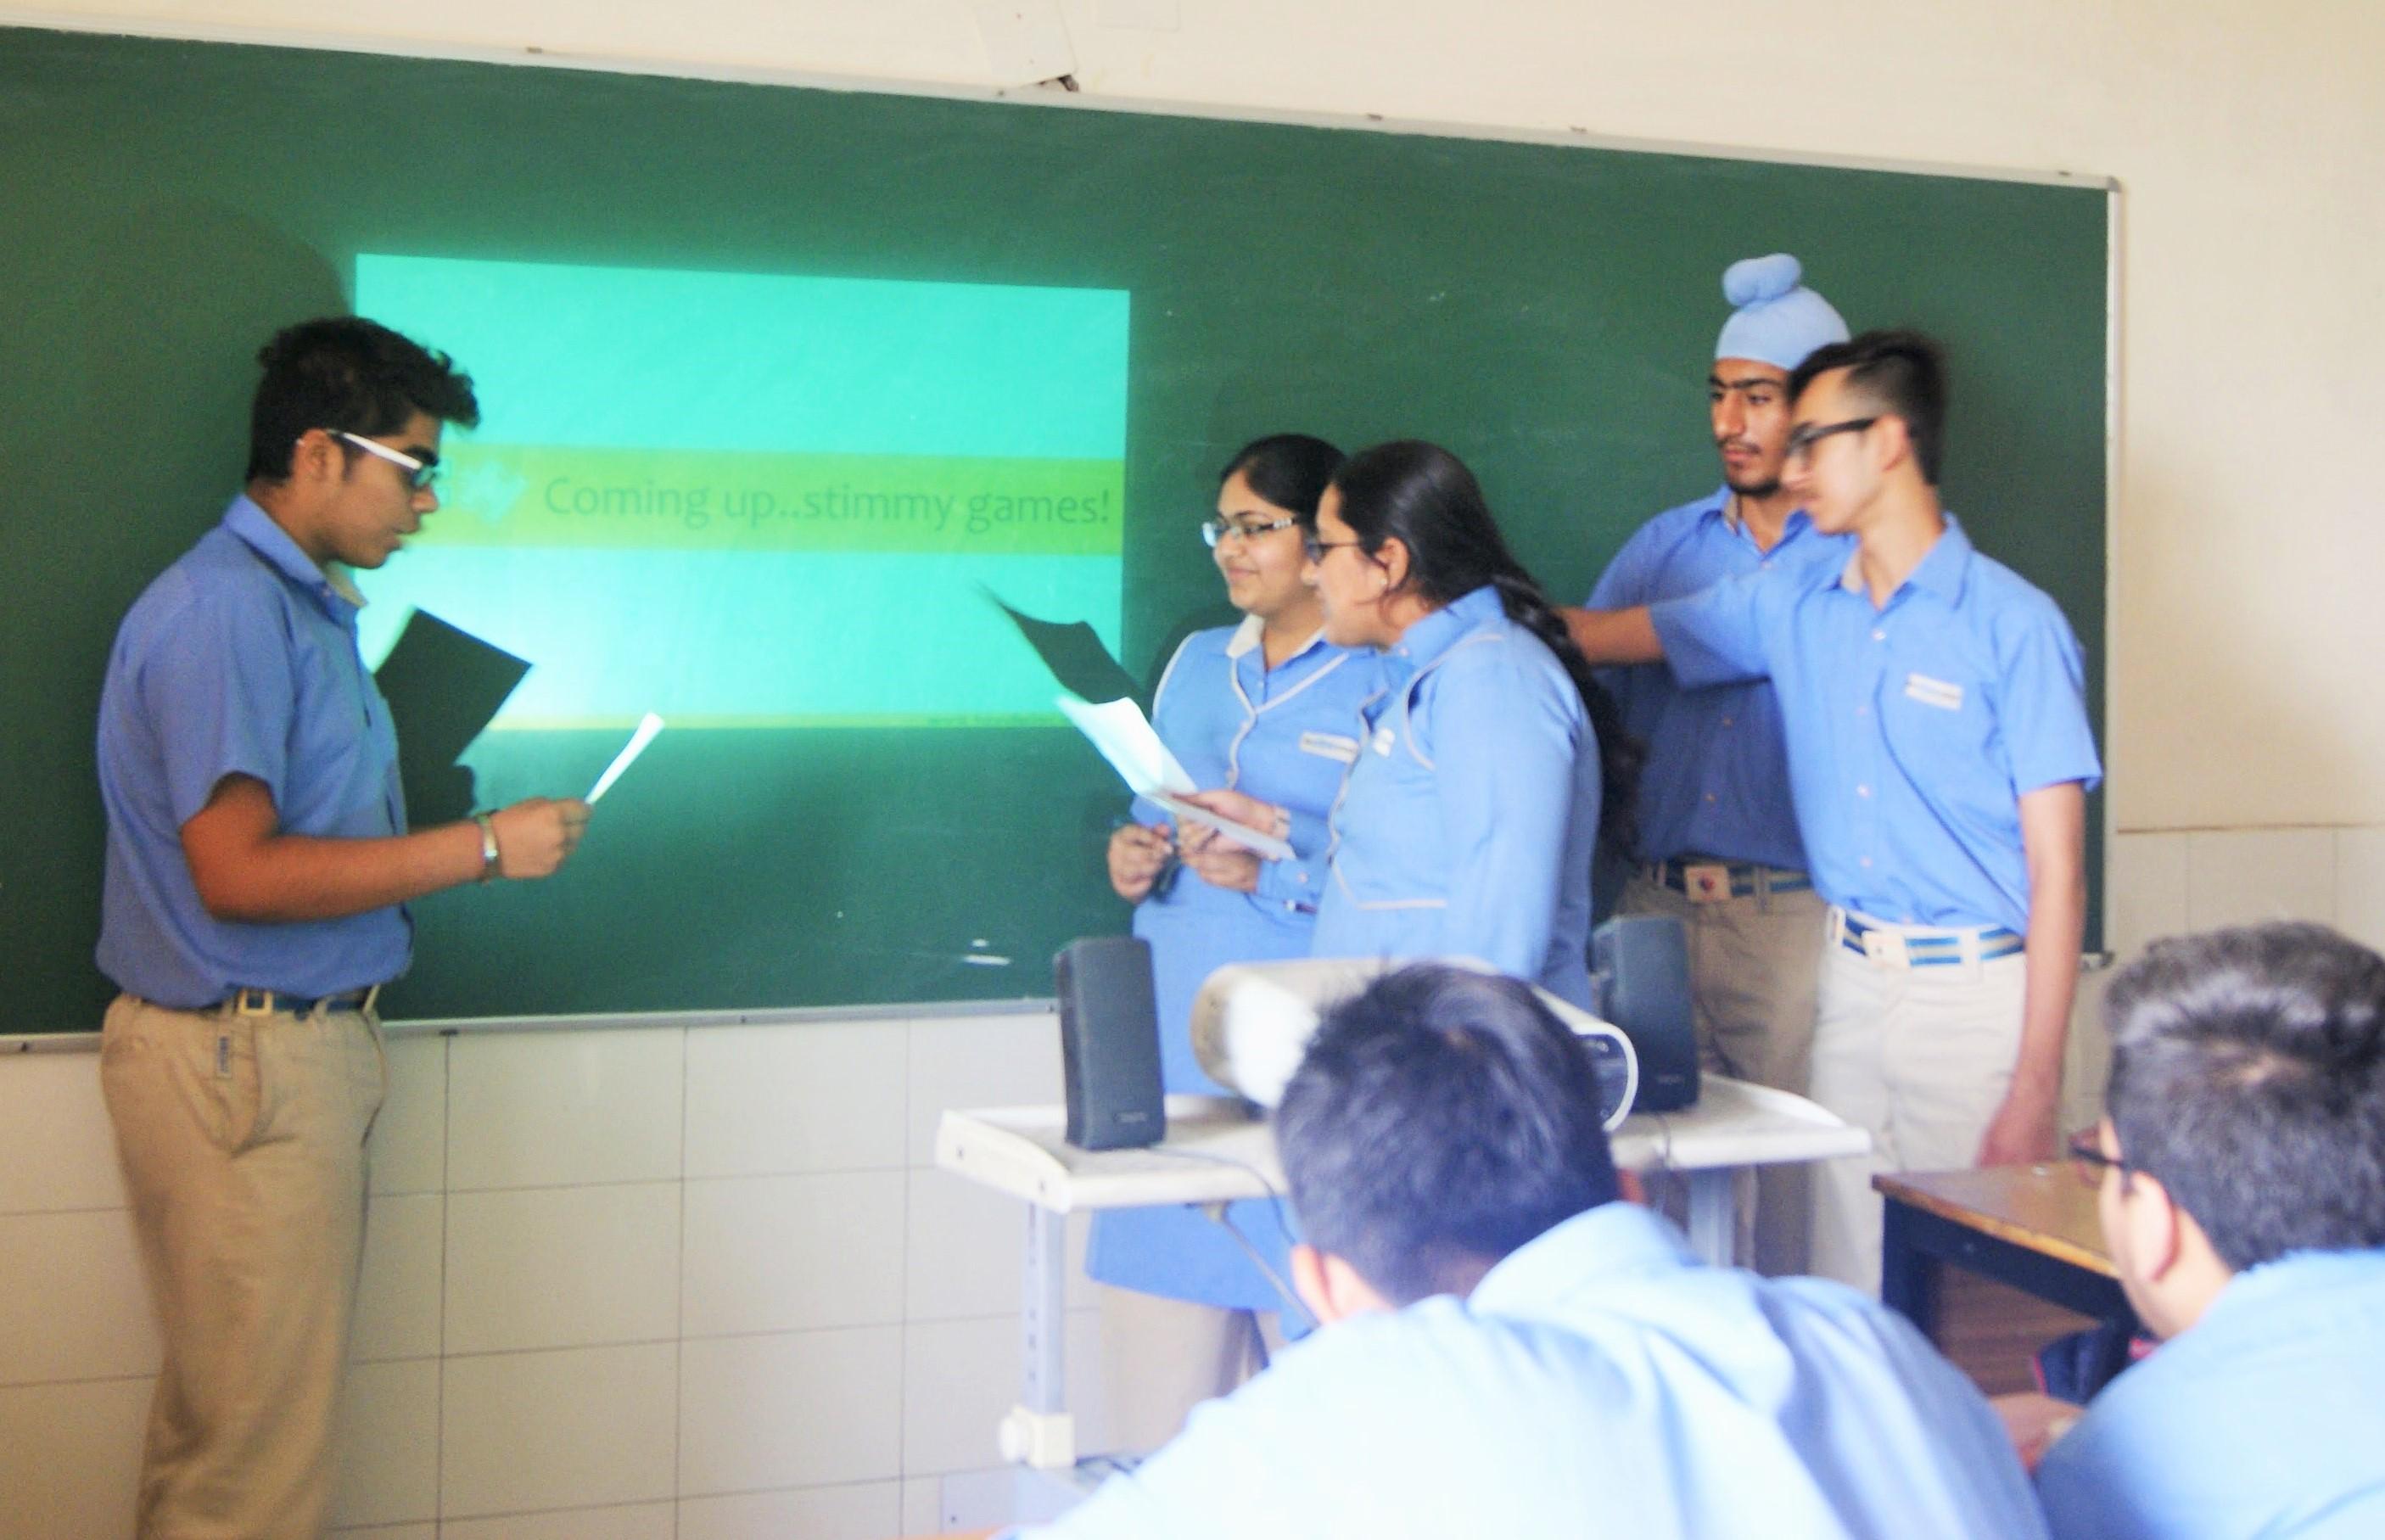 Srijan school students playing stimmy games